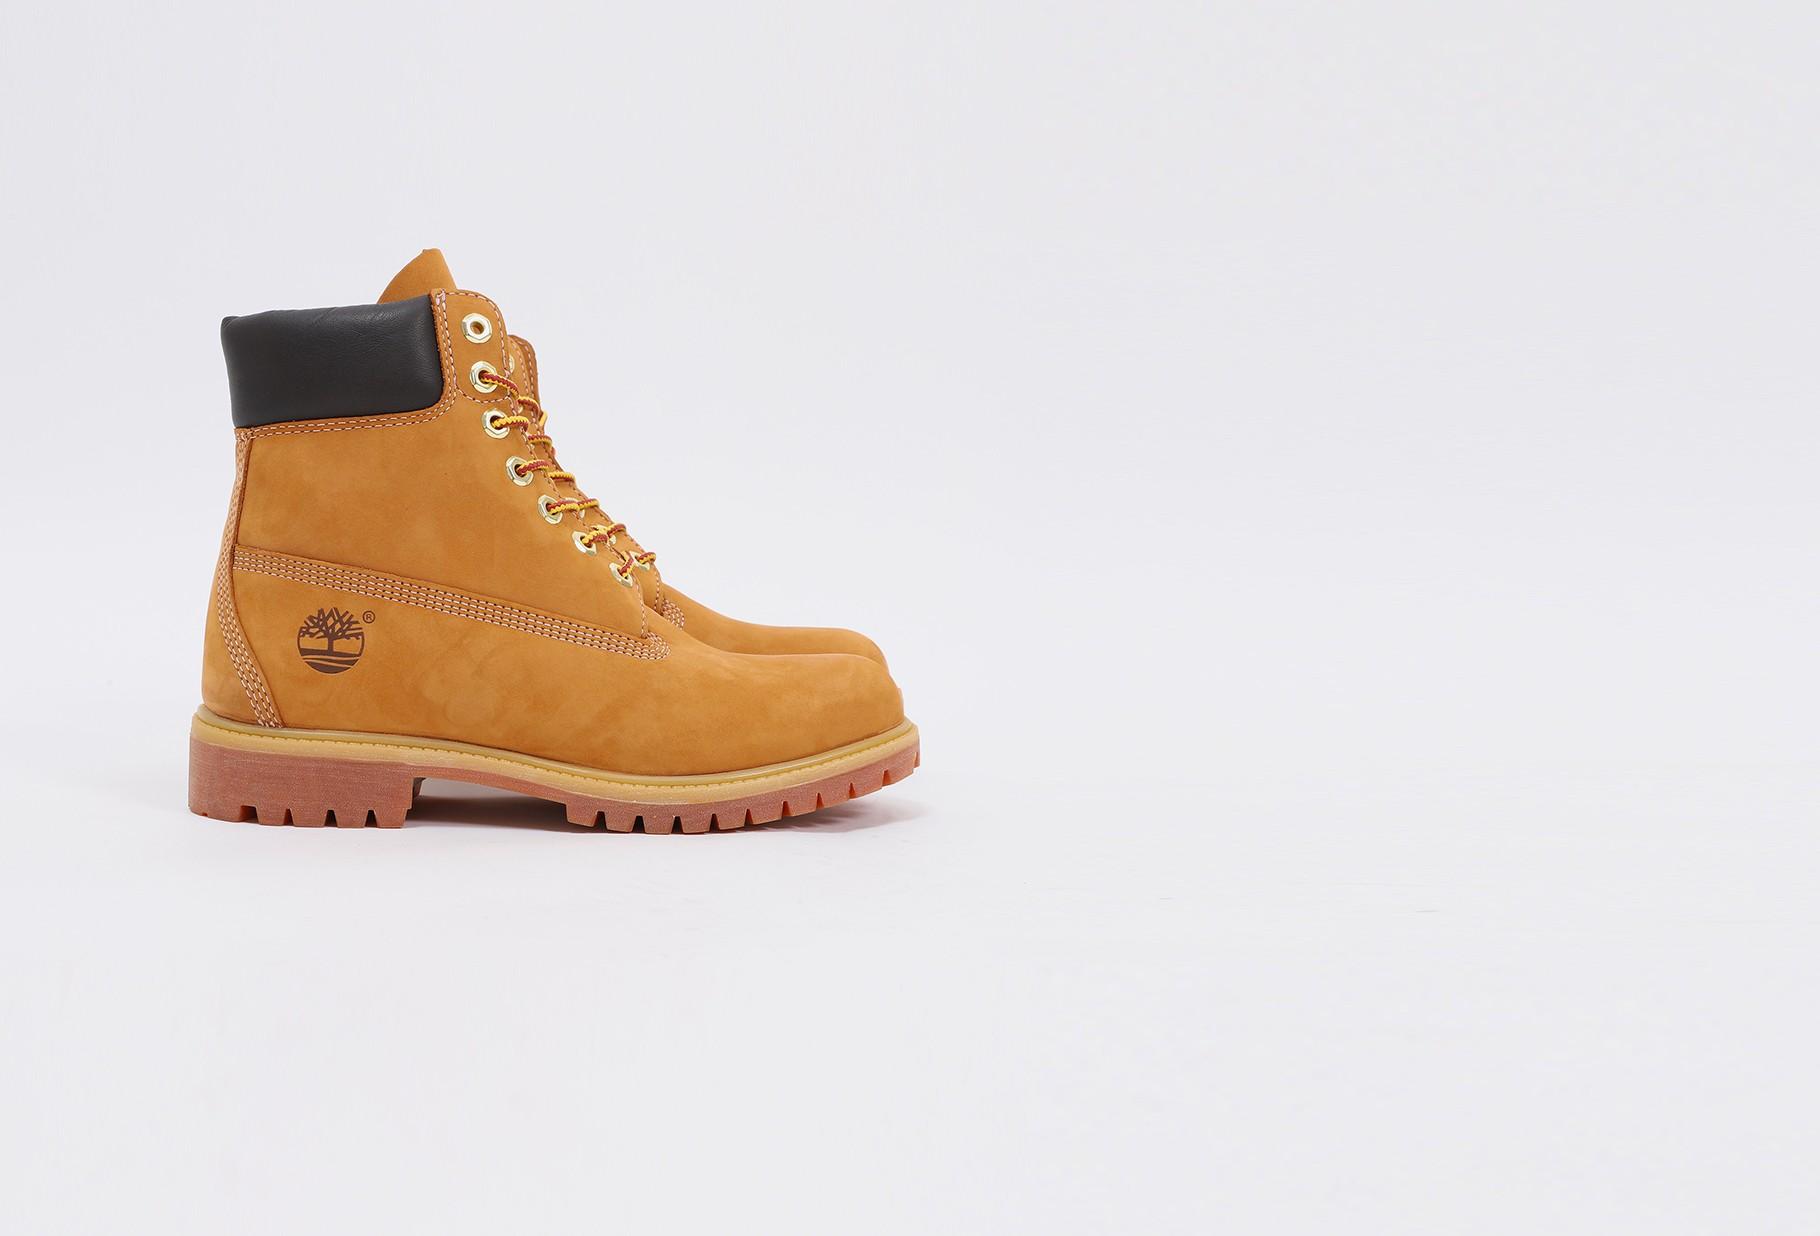 TIMBERLAND / Original 6-inch boot Brown